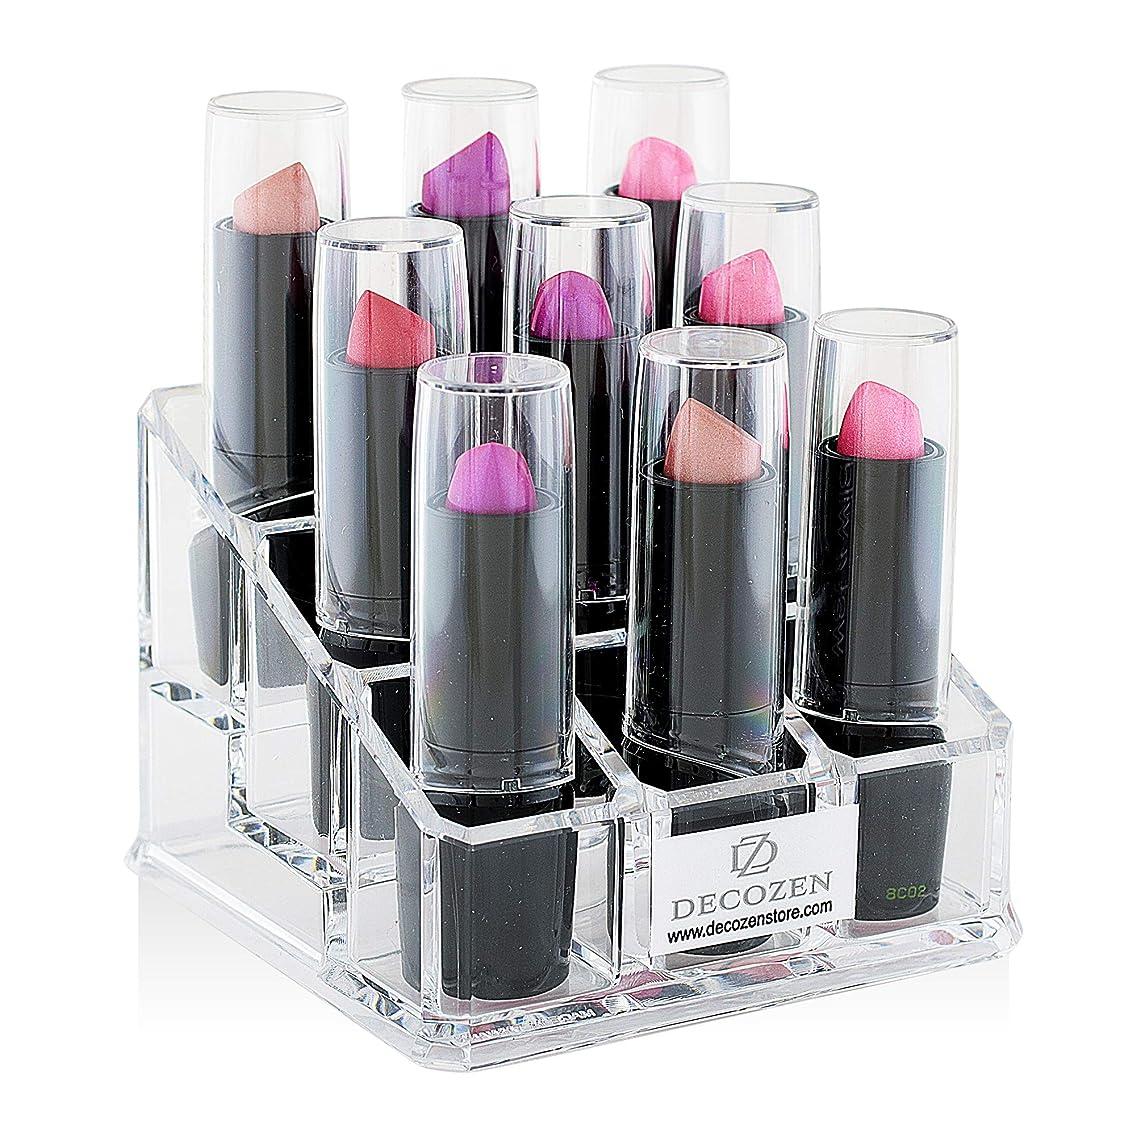 Decozen Makeup Organizer Storage Lipstick Holder 9 slot for Lipstick Lipgloss Mascara Essential Oil etc